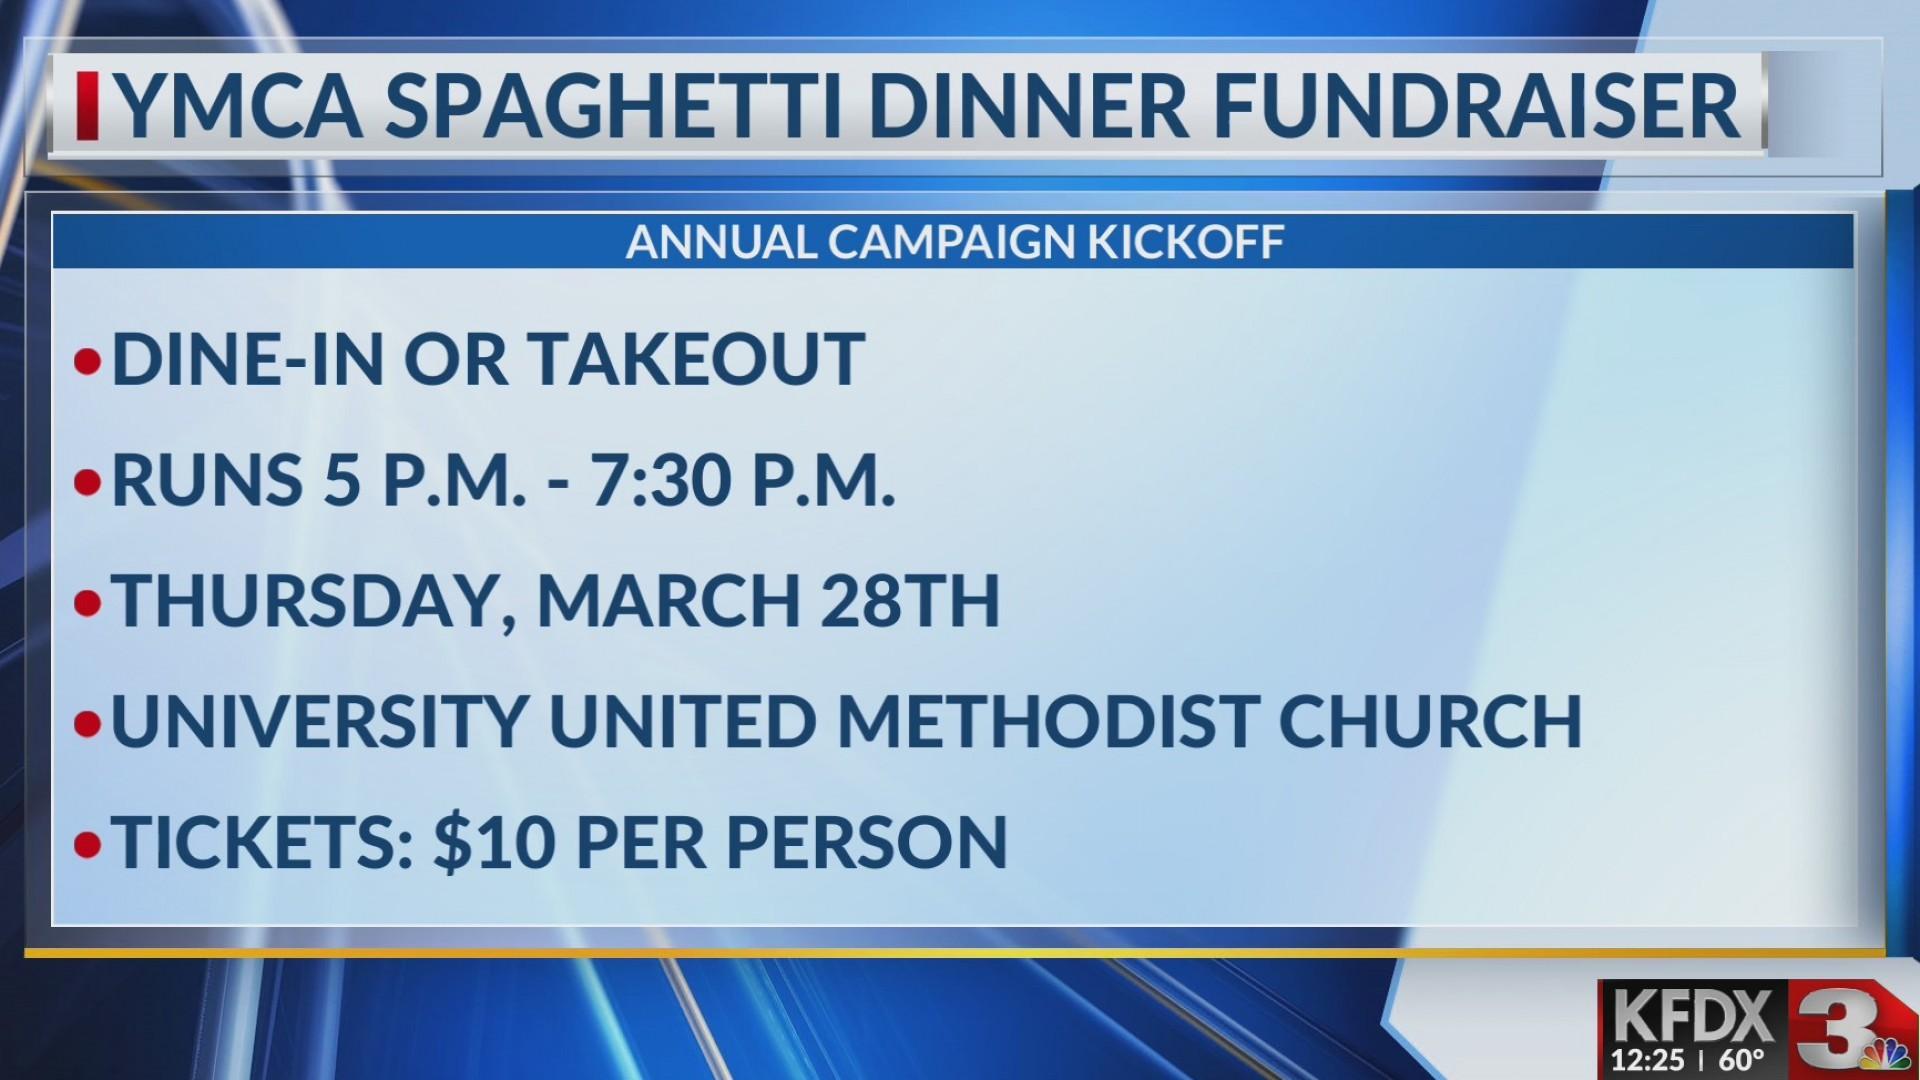 YMCA_Spaghetti_dinner_fundraiser_0_20190313174038